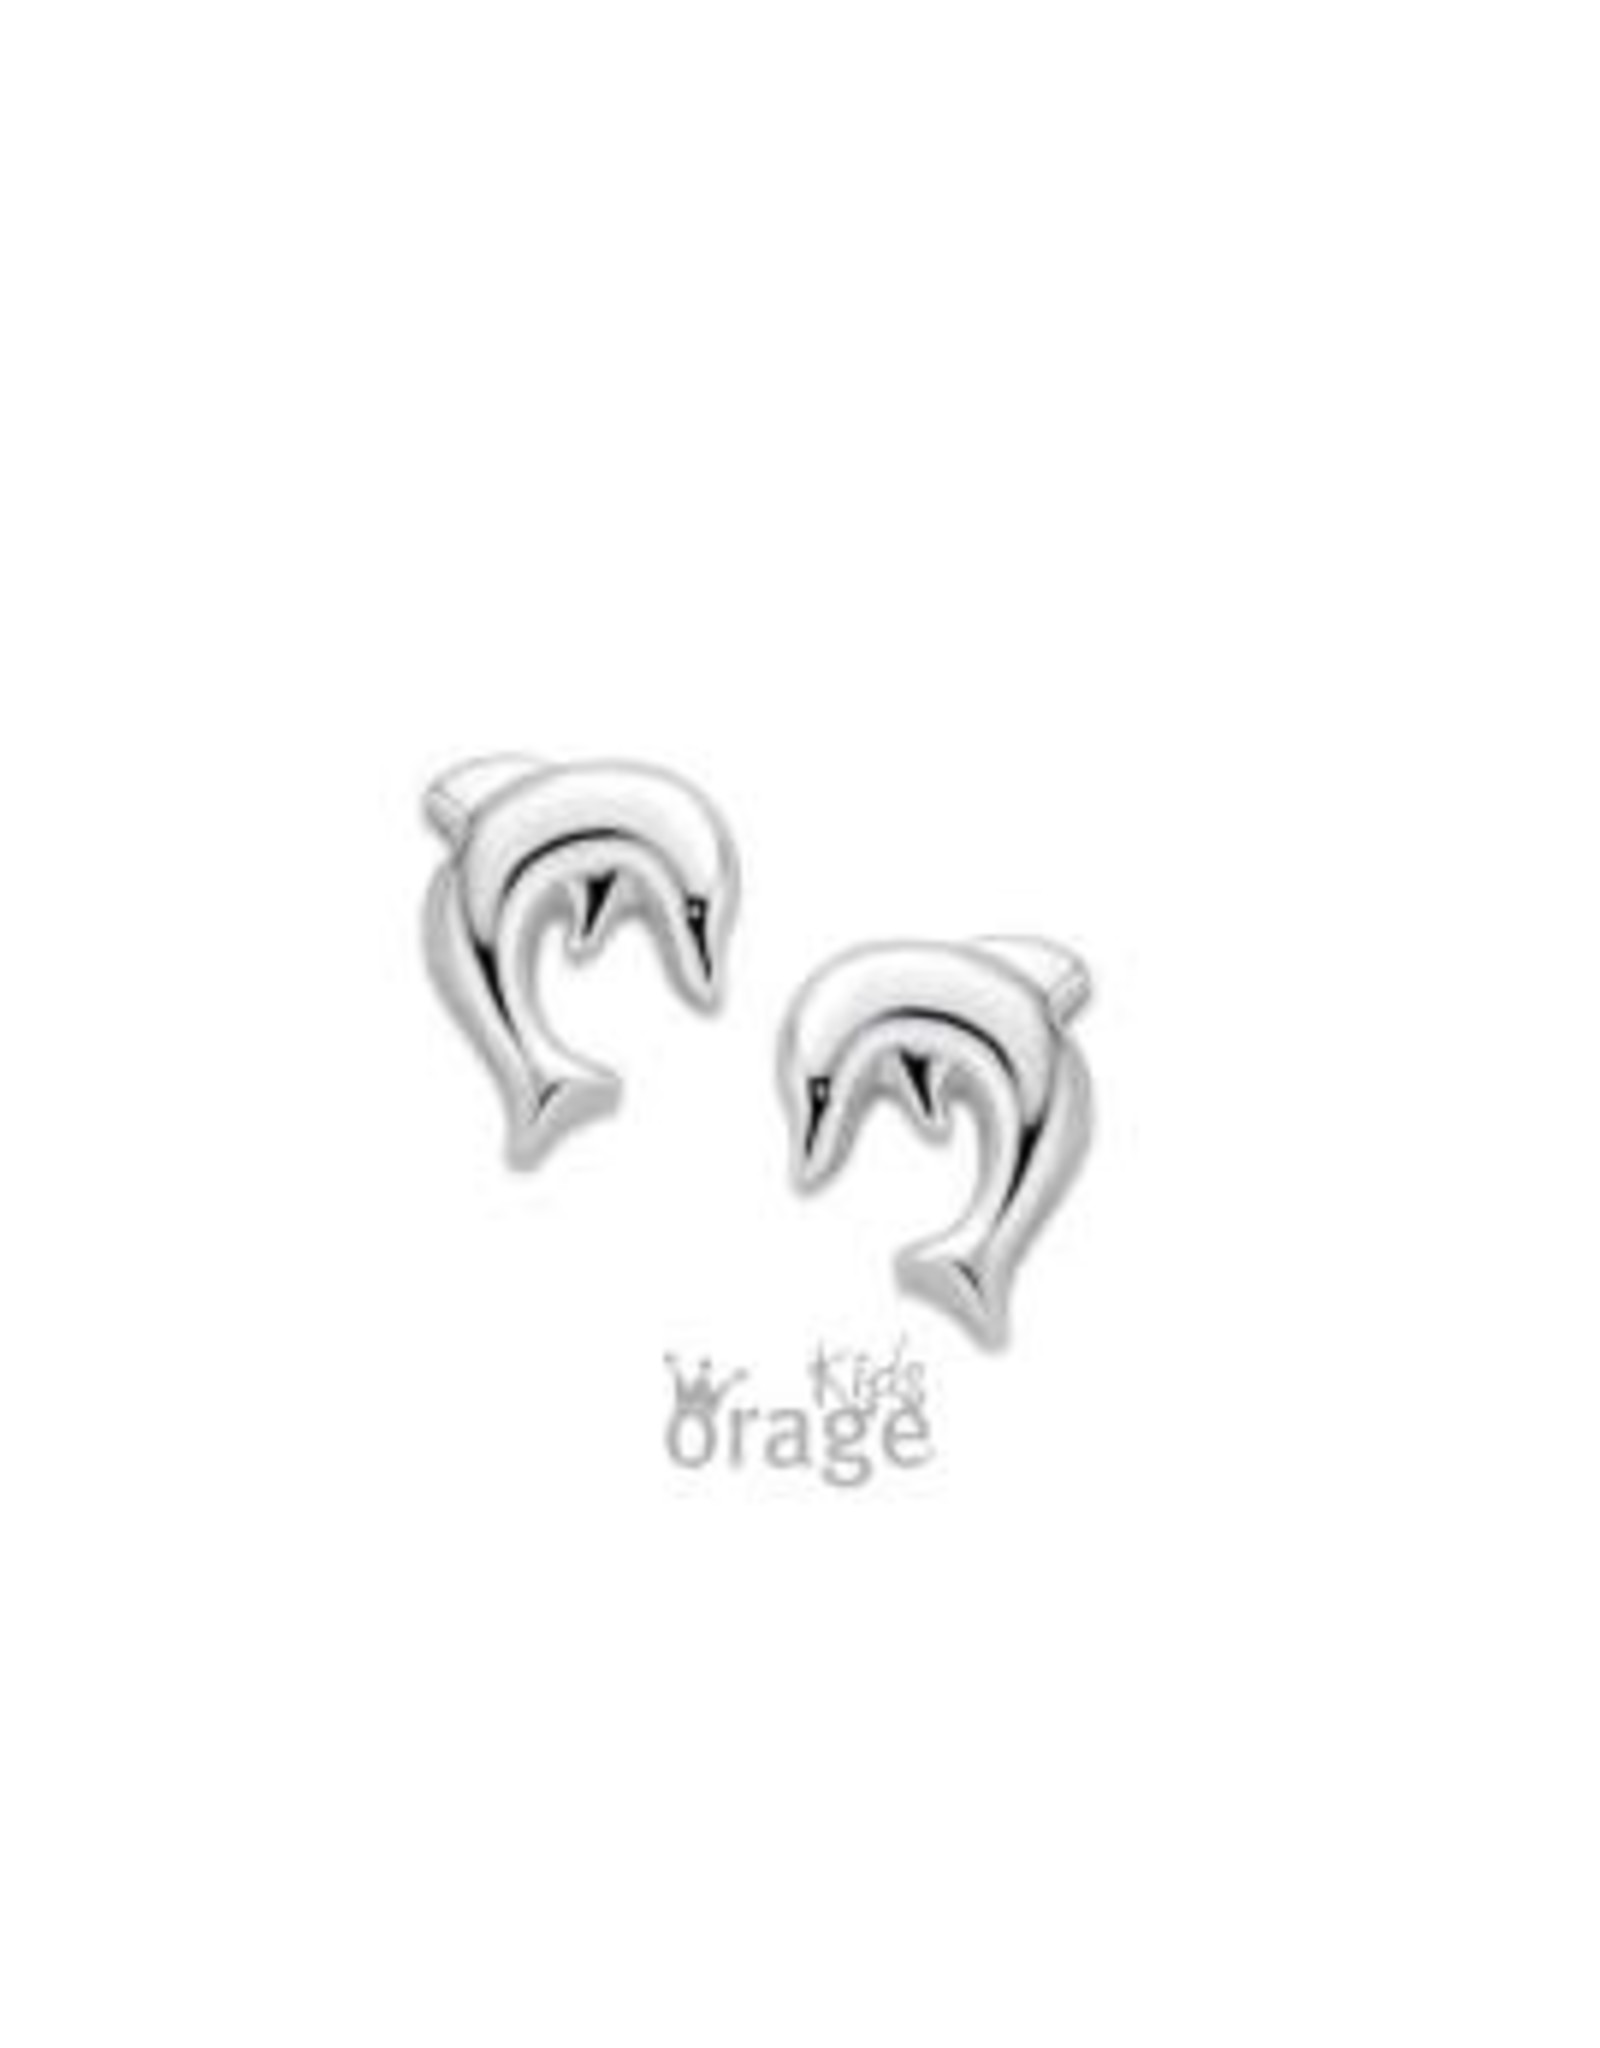 Orage Kids Oorbellen Orage Kids K2102 Dolfijn Zilver